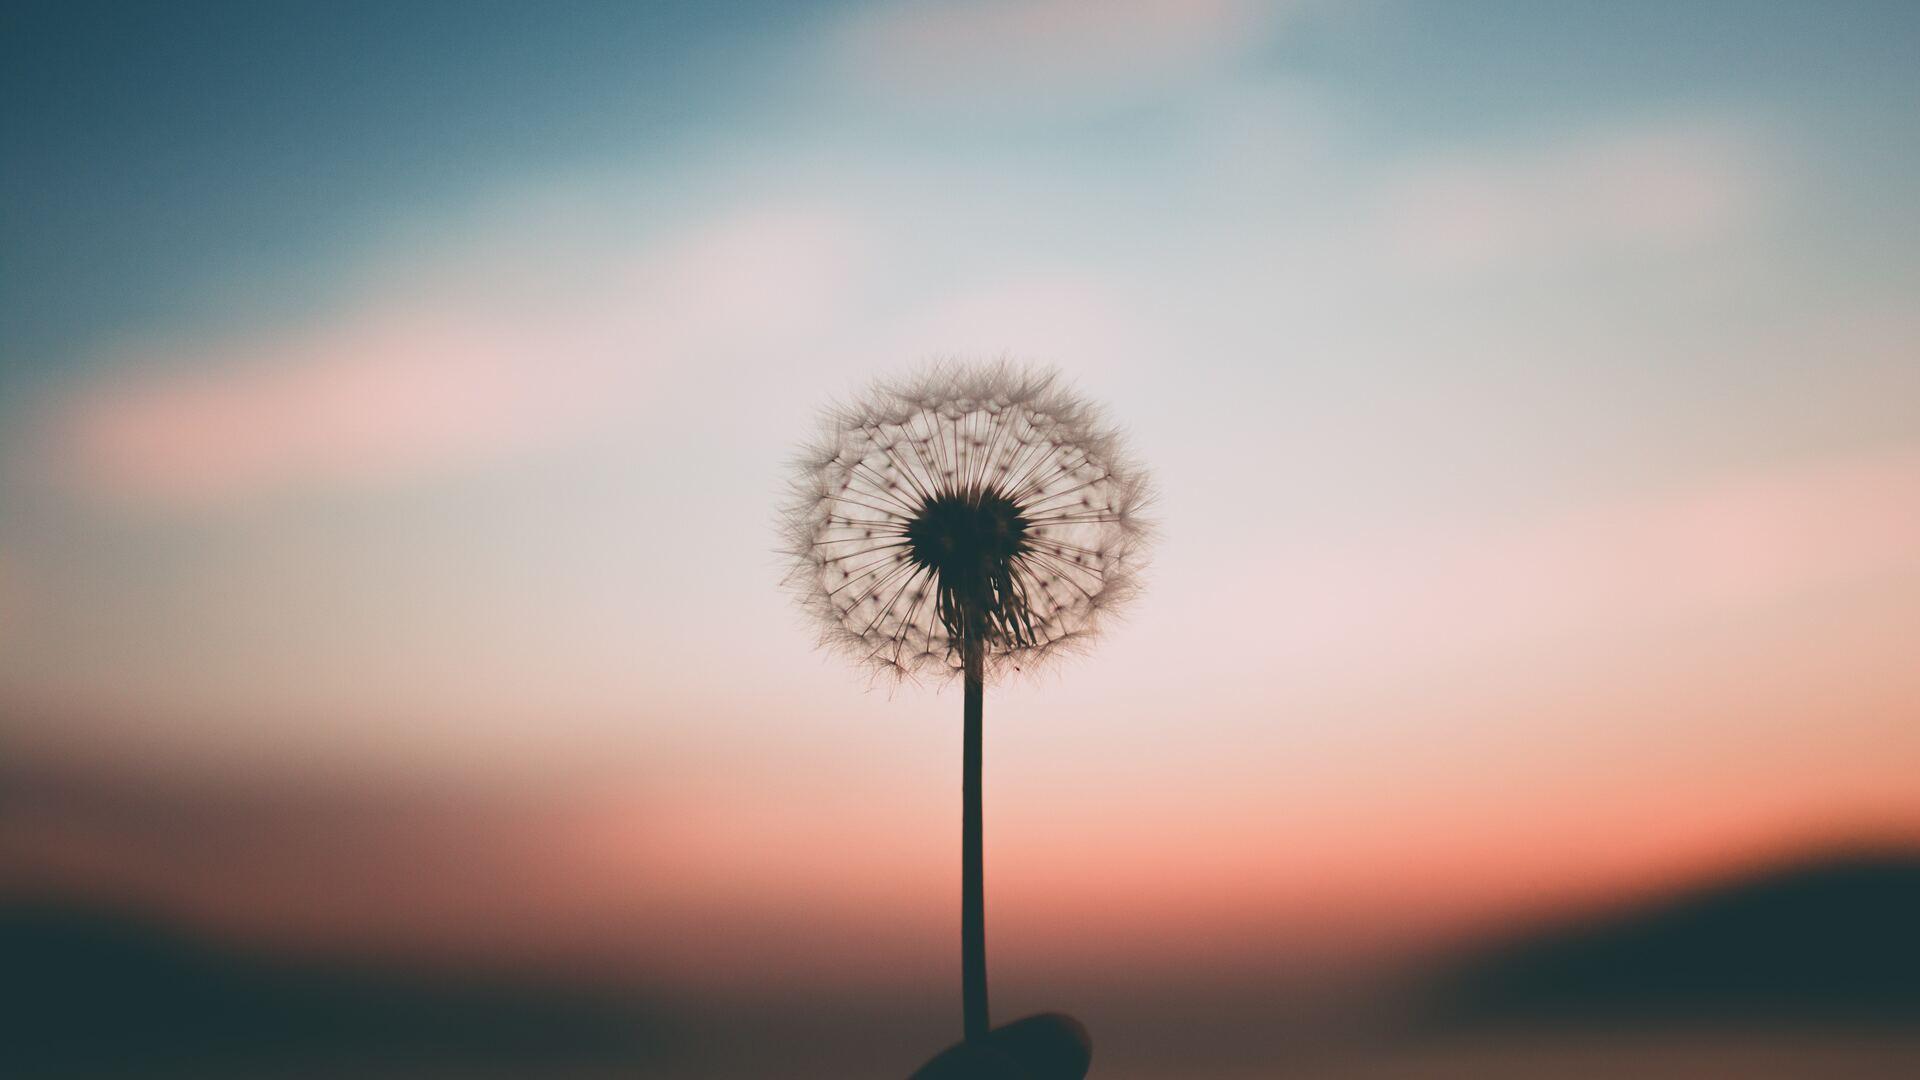 dandelion-4k-84.jpg